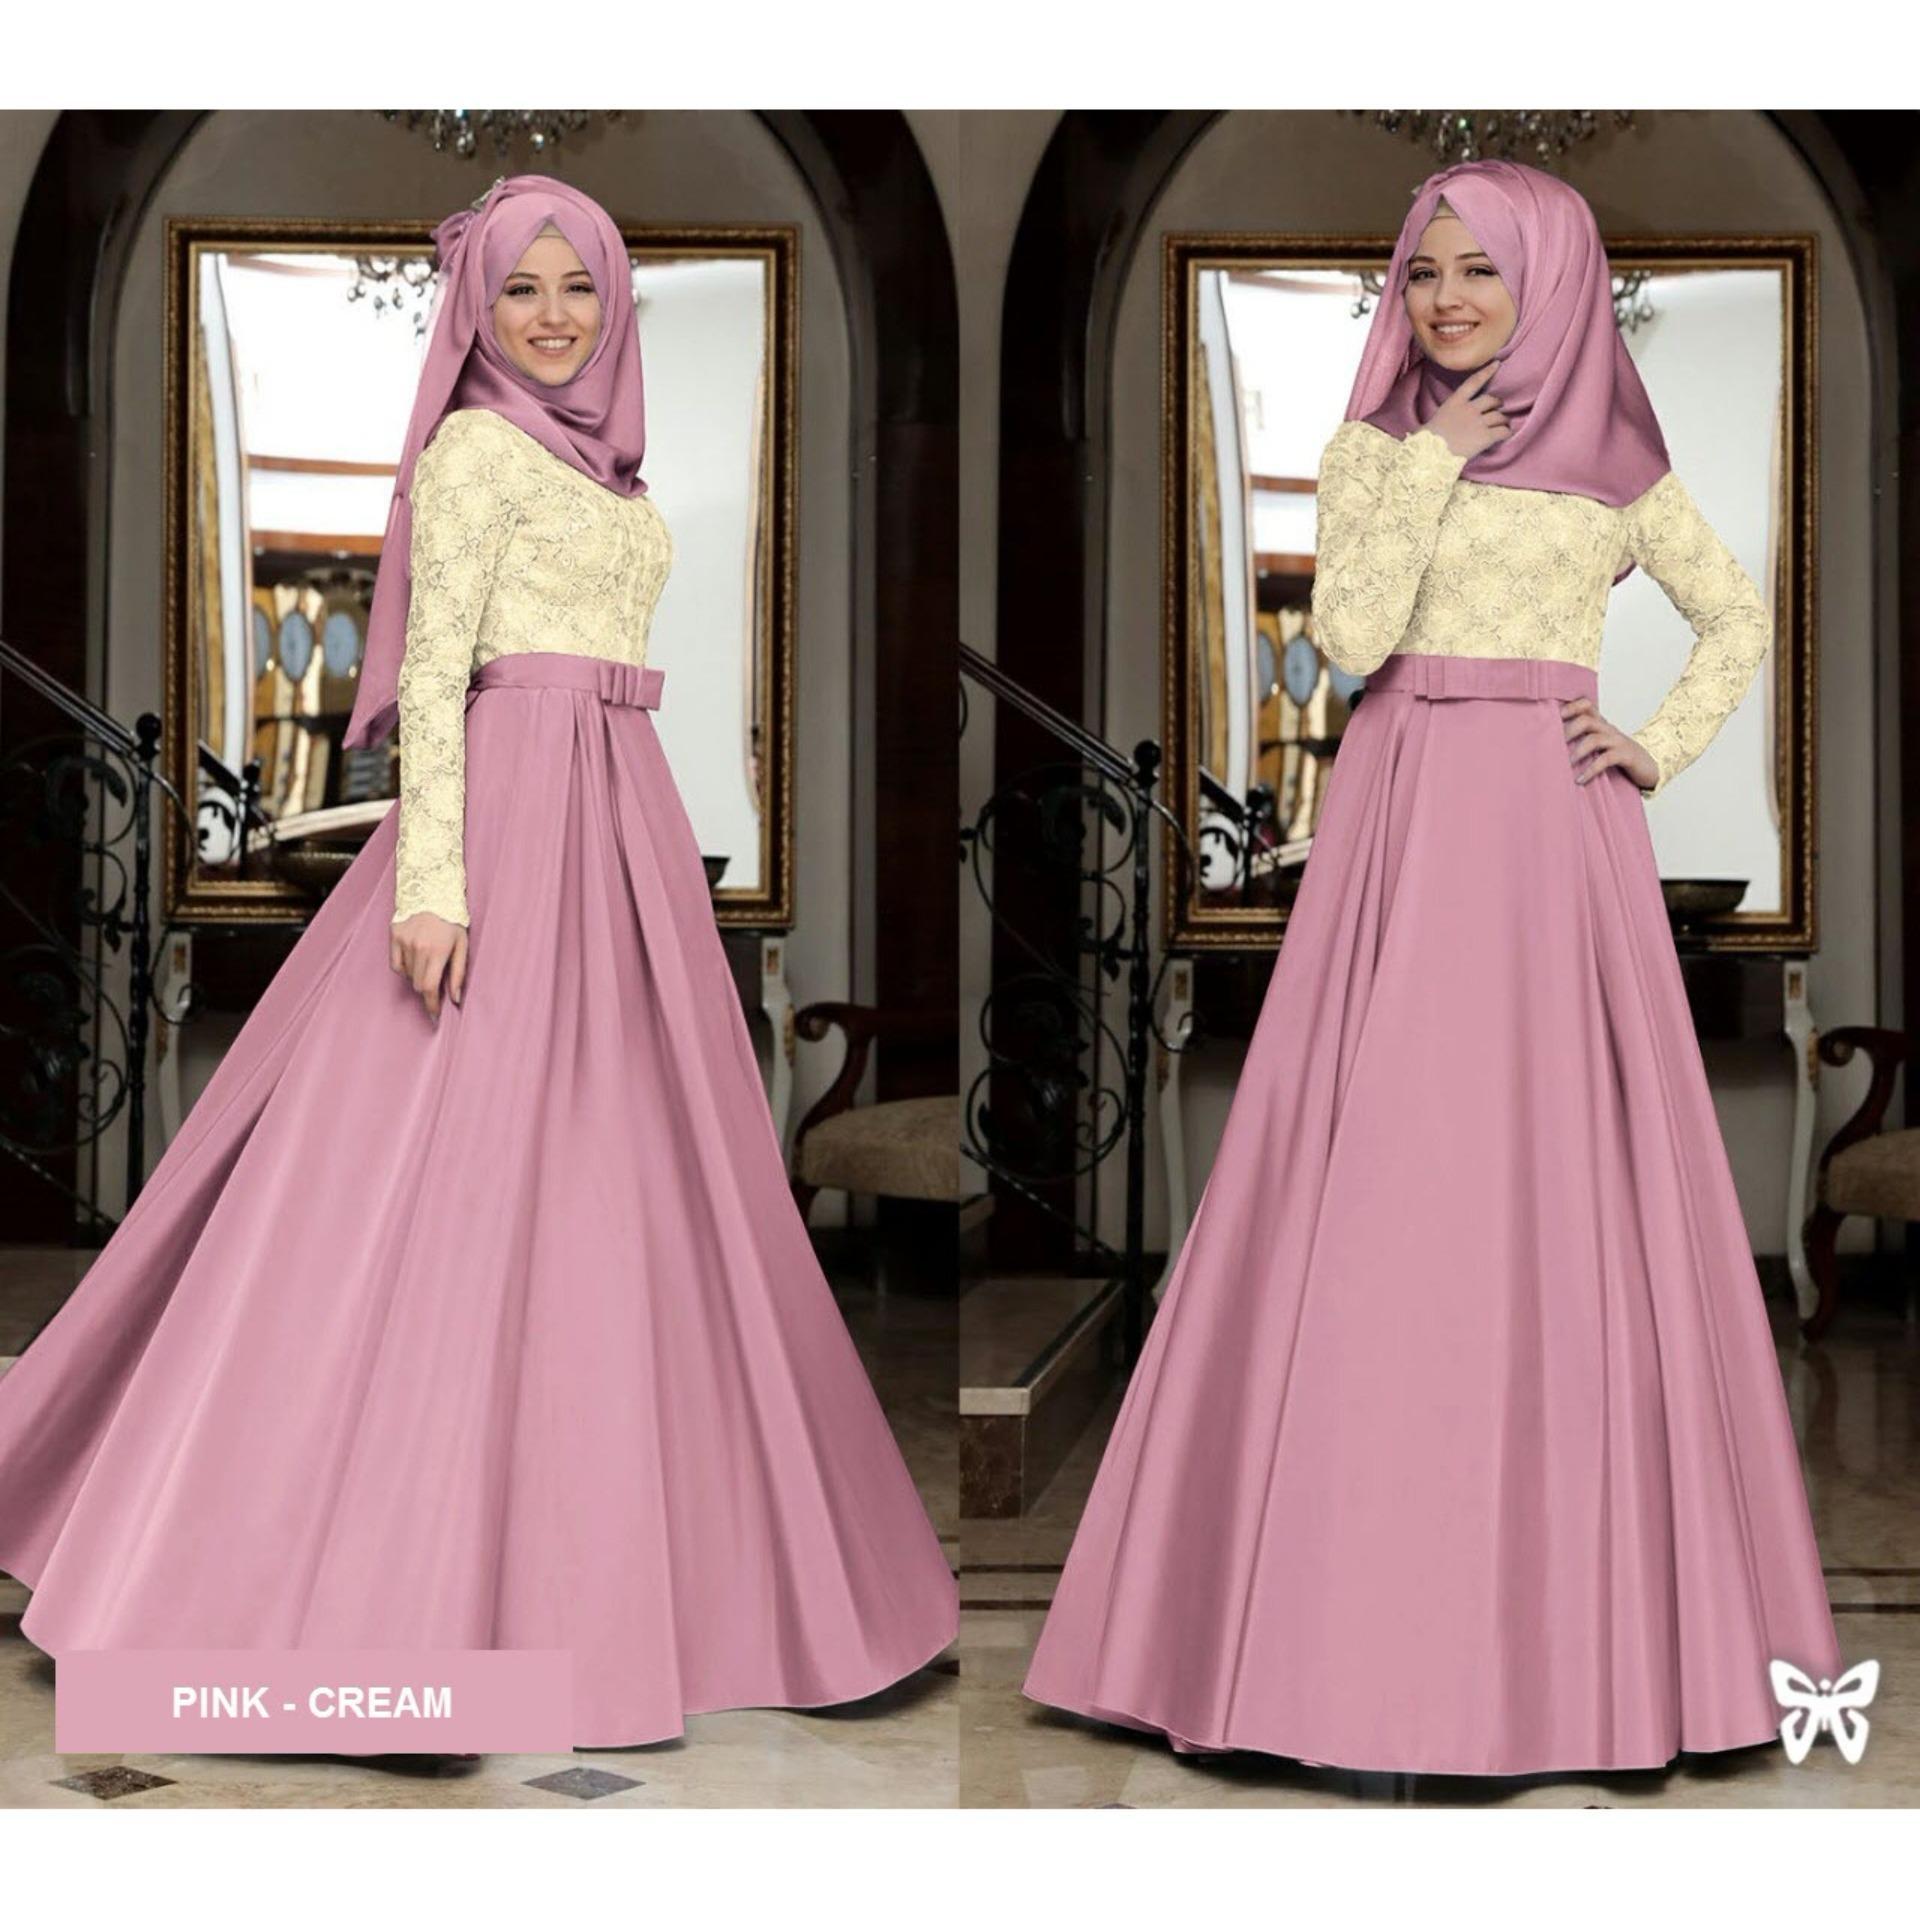 Flavia Store Maxi Dress Lengan Panjang Set 2 in 1 FS0720 - DUSTY PINK / Gamis Syari / Gaun Pesta Muslimah / Baju Muslim Wanita Syar'i / Hijab / Srmahira